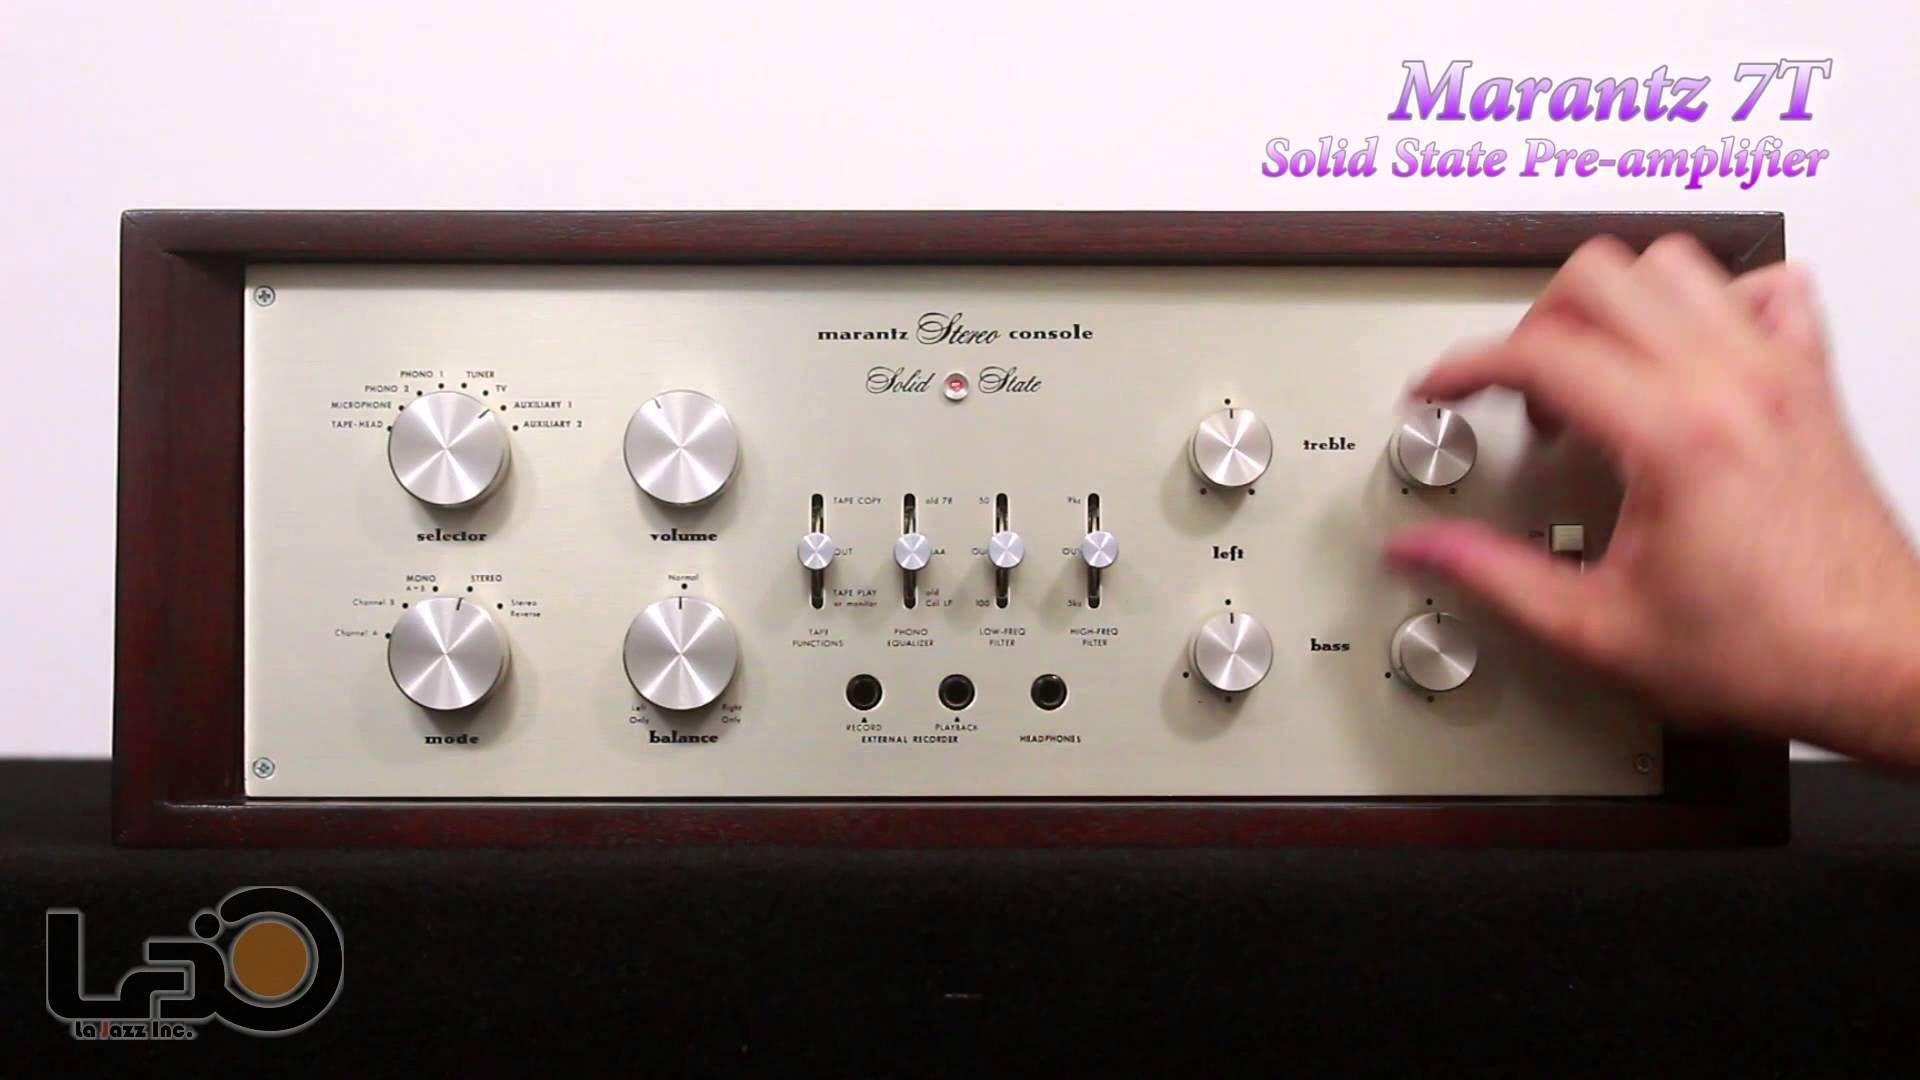 Marantz 7T Solid State Pre Amplifier